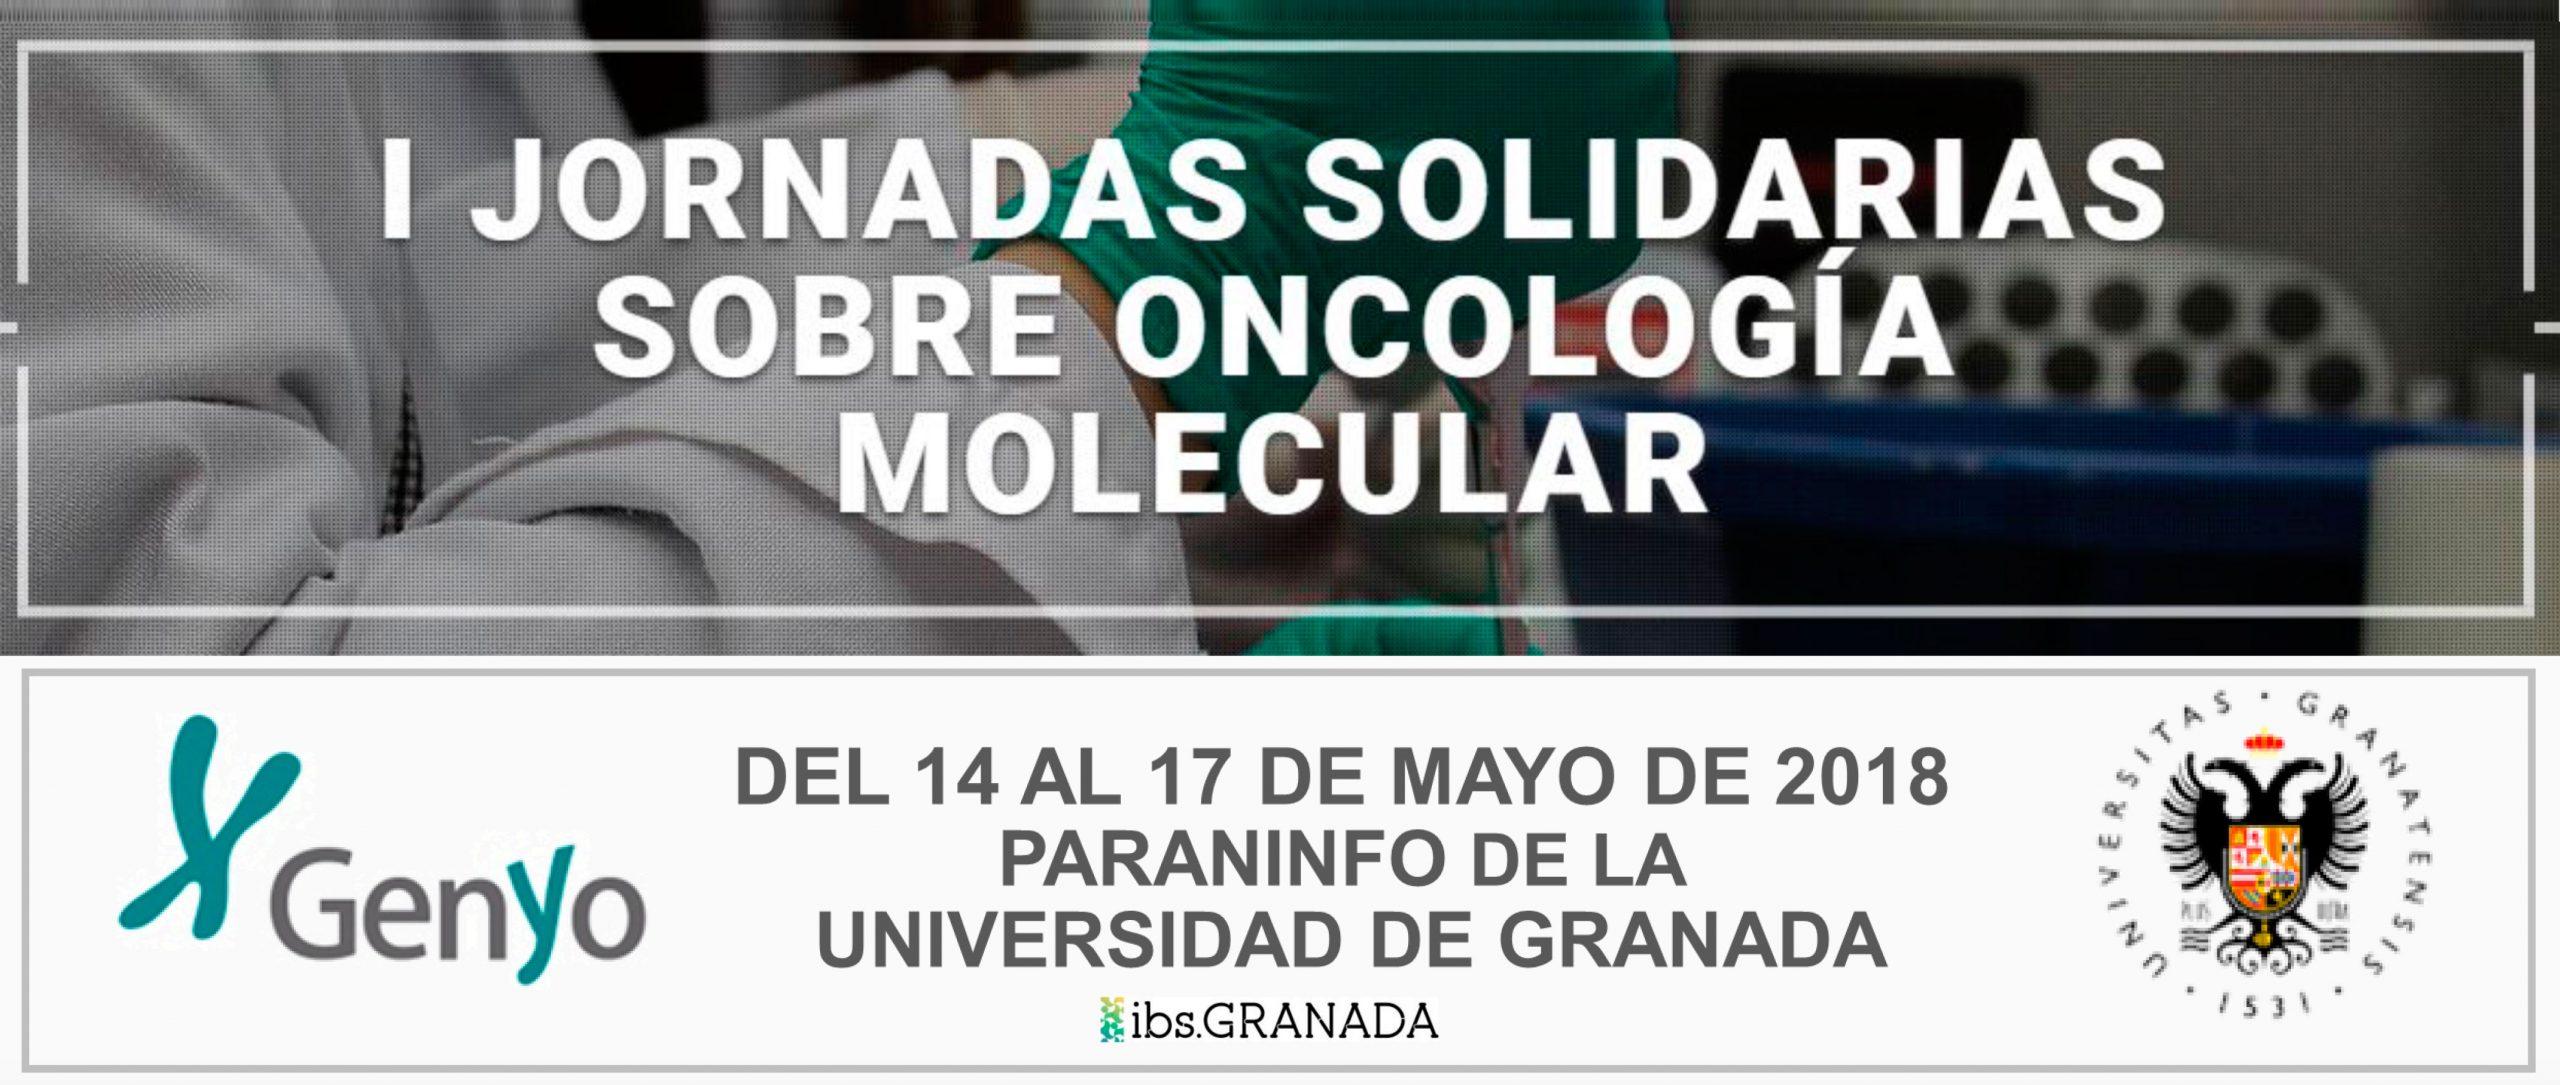 I Jornadas sobre Oncología Molecular